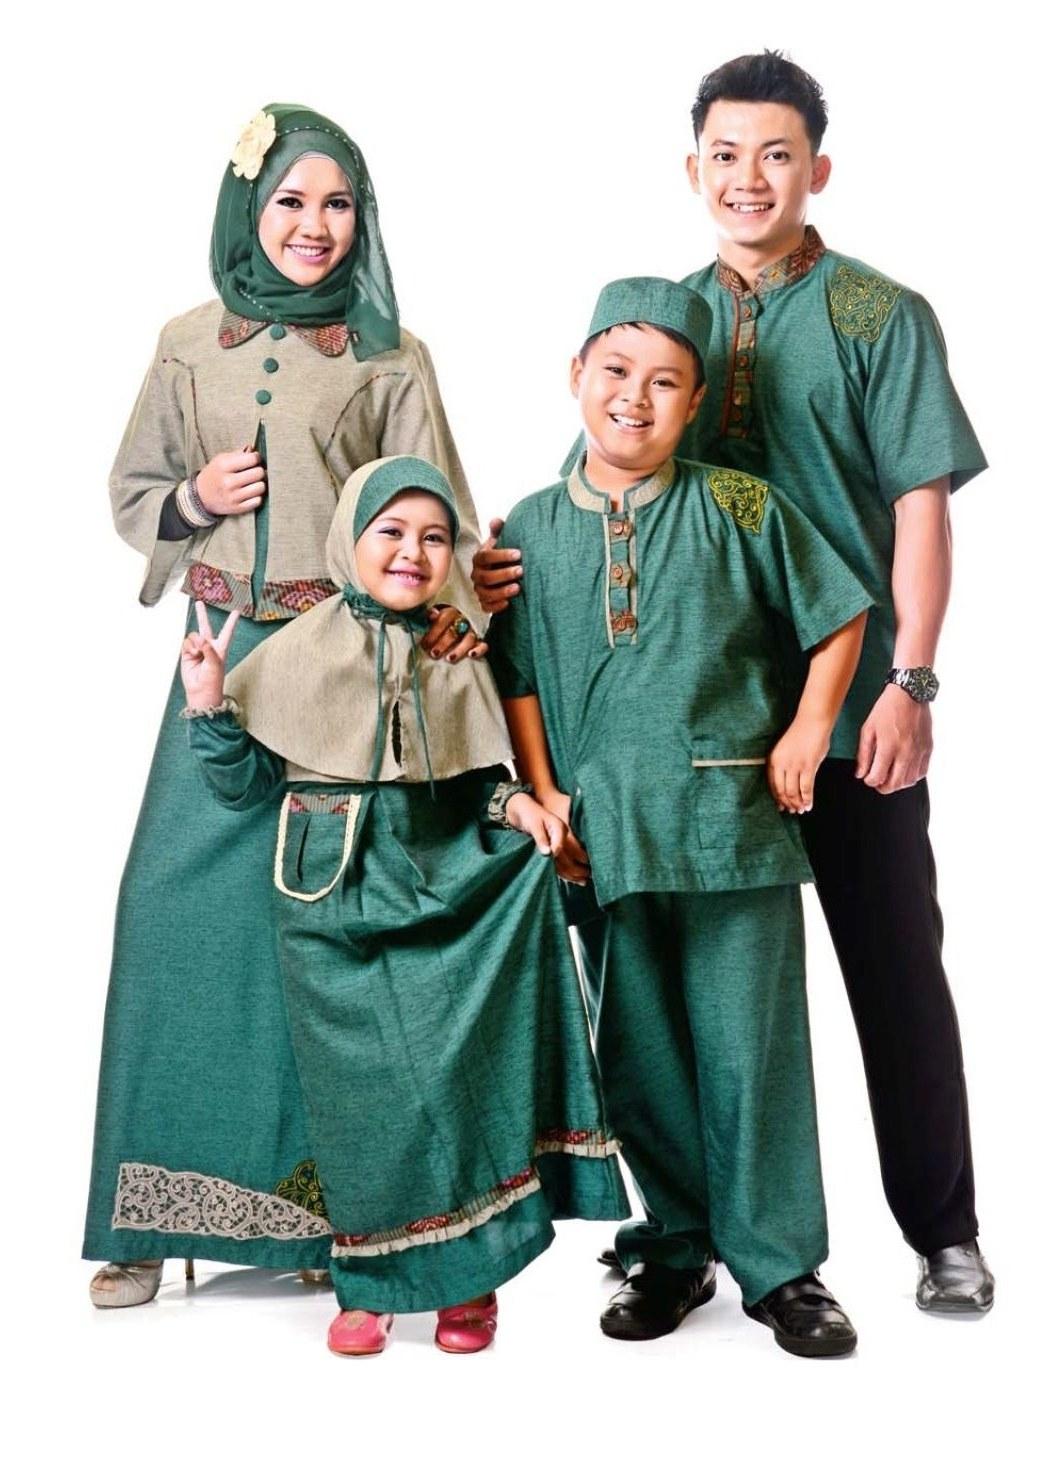 Inspirasi Baju Lebaran Untuk Anak Anak 4pde Baju Lebaran Keluarga 2016